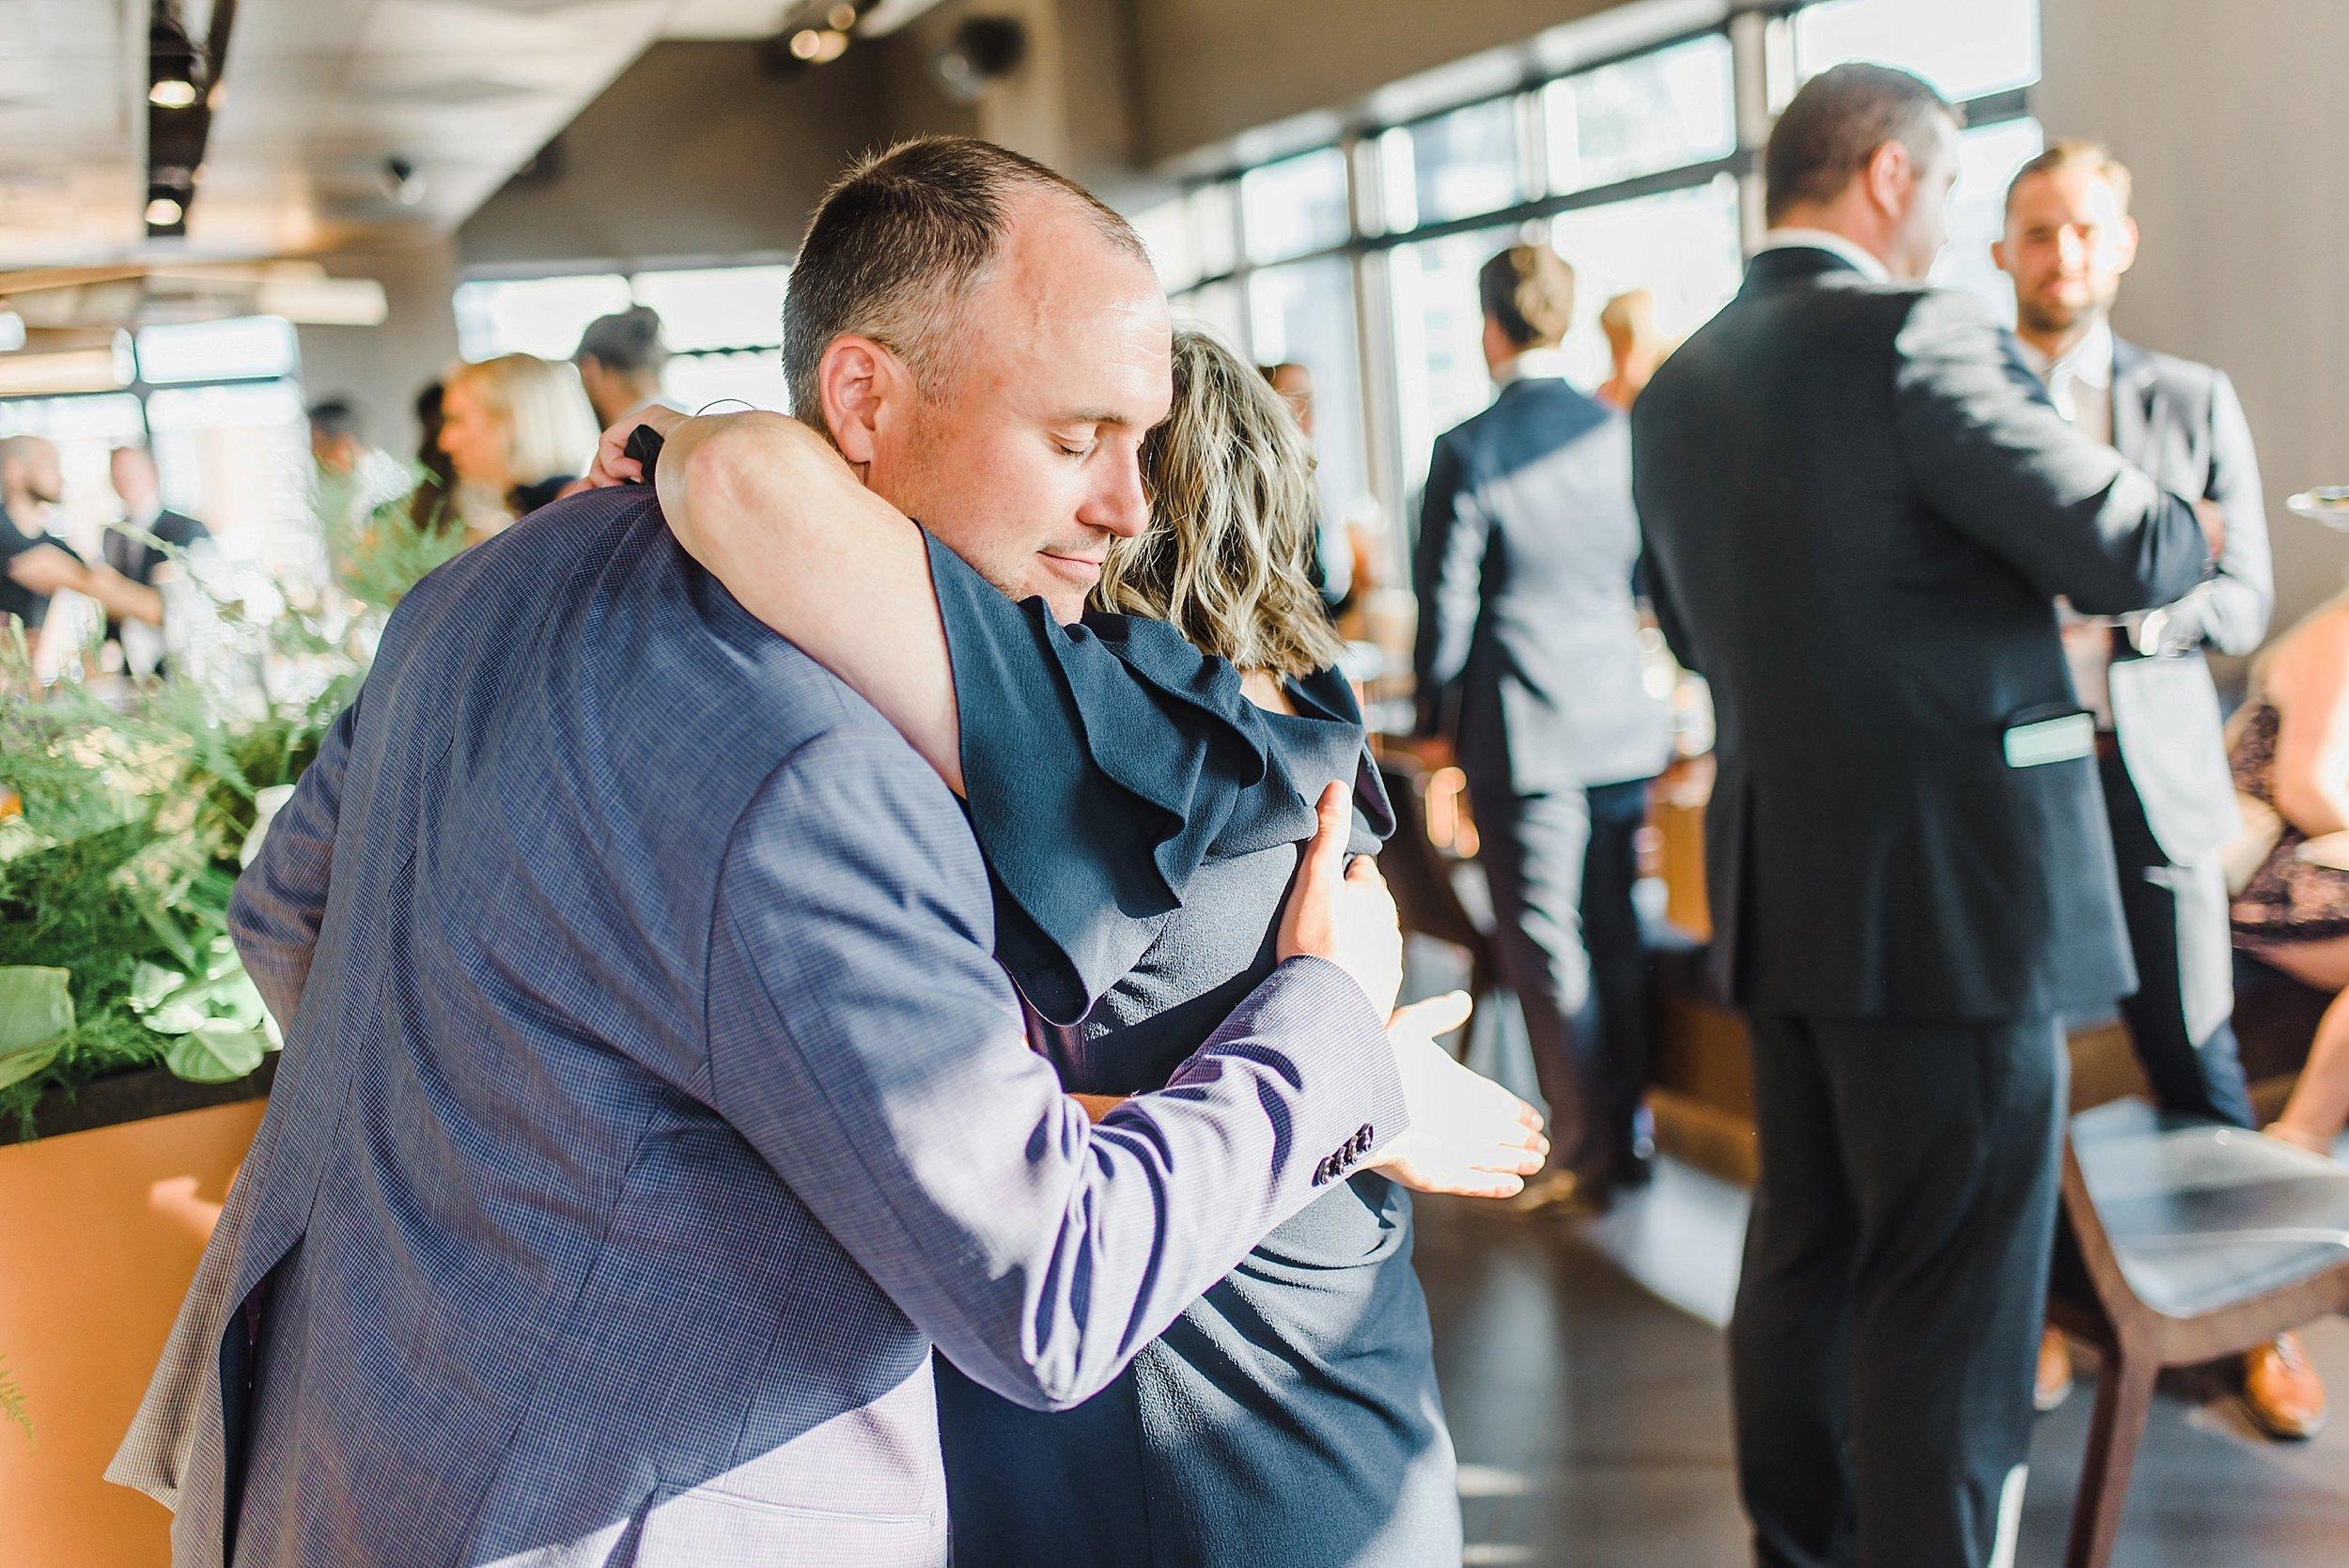 light airy indie fine art ottawa wedding photographer | Ali and Batoul Photography_0701.jpg